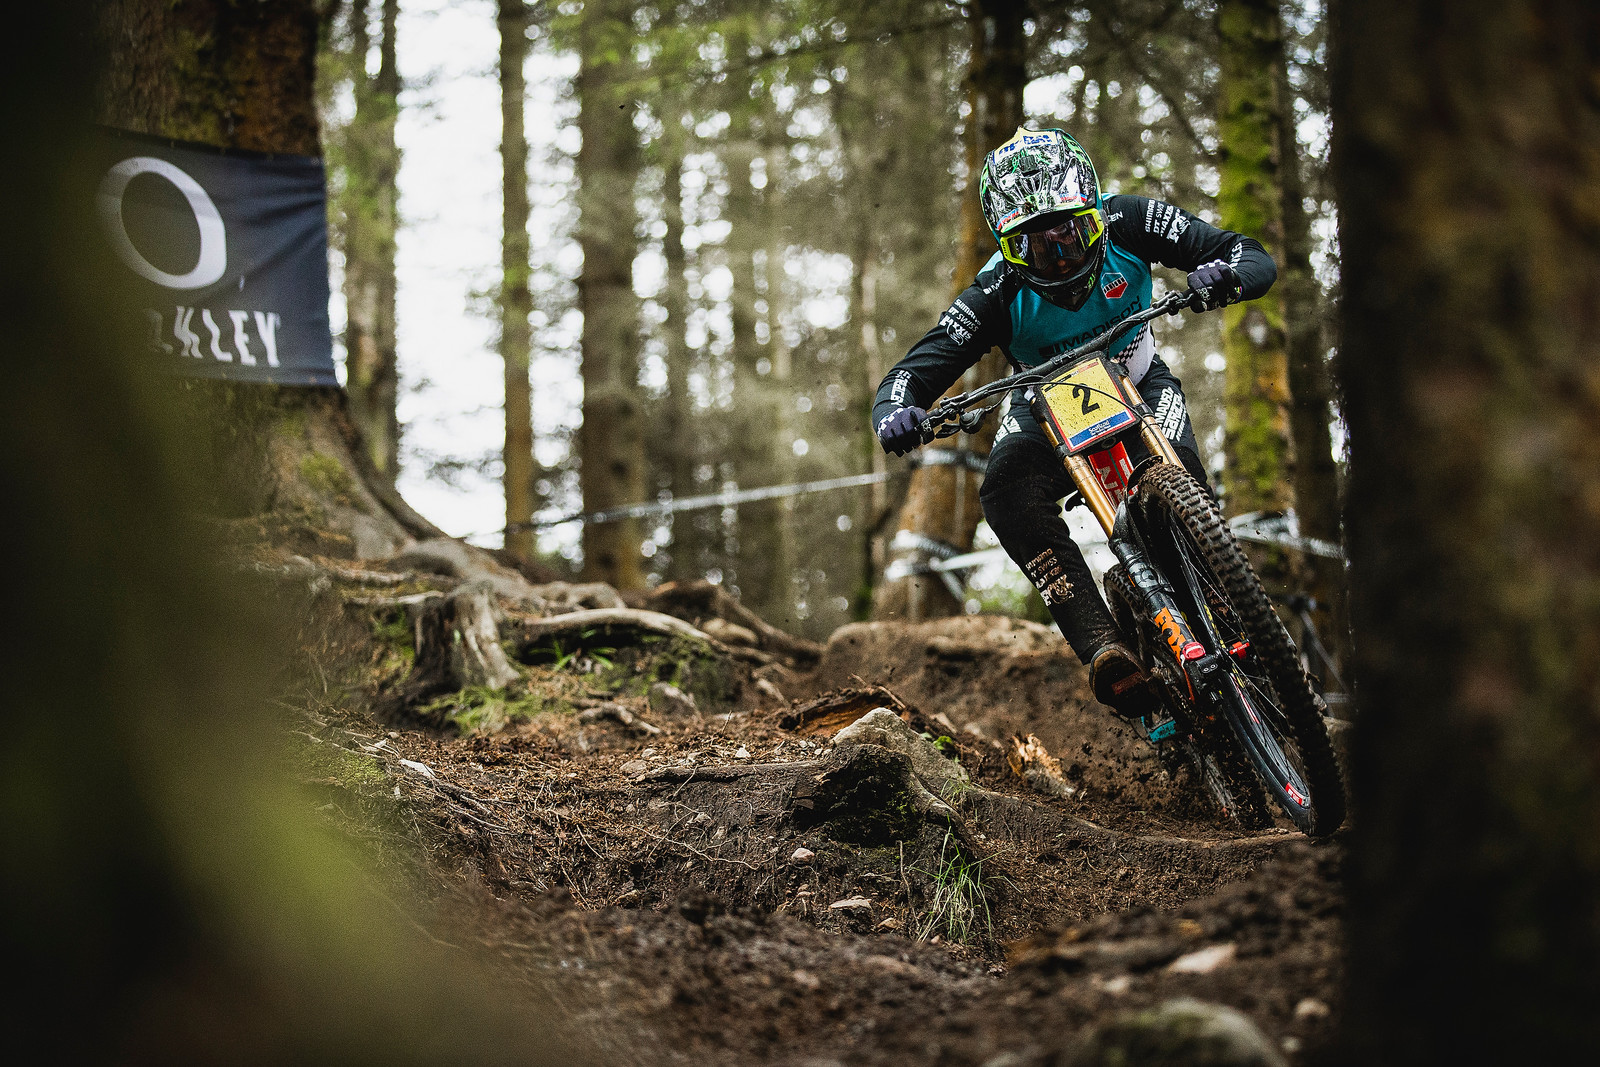 Danny Hart 2019 World Cup Downhill Photos - Danny Hart 2019 World Cup Downhill Photos - Mountain Biking Pictures - Vital MTB